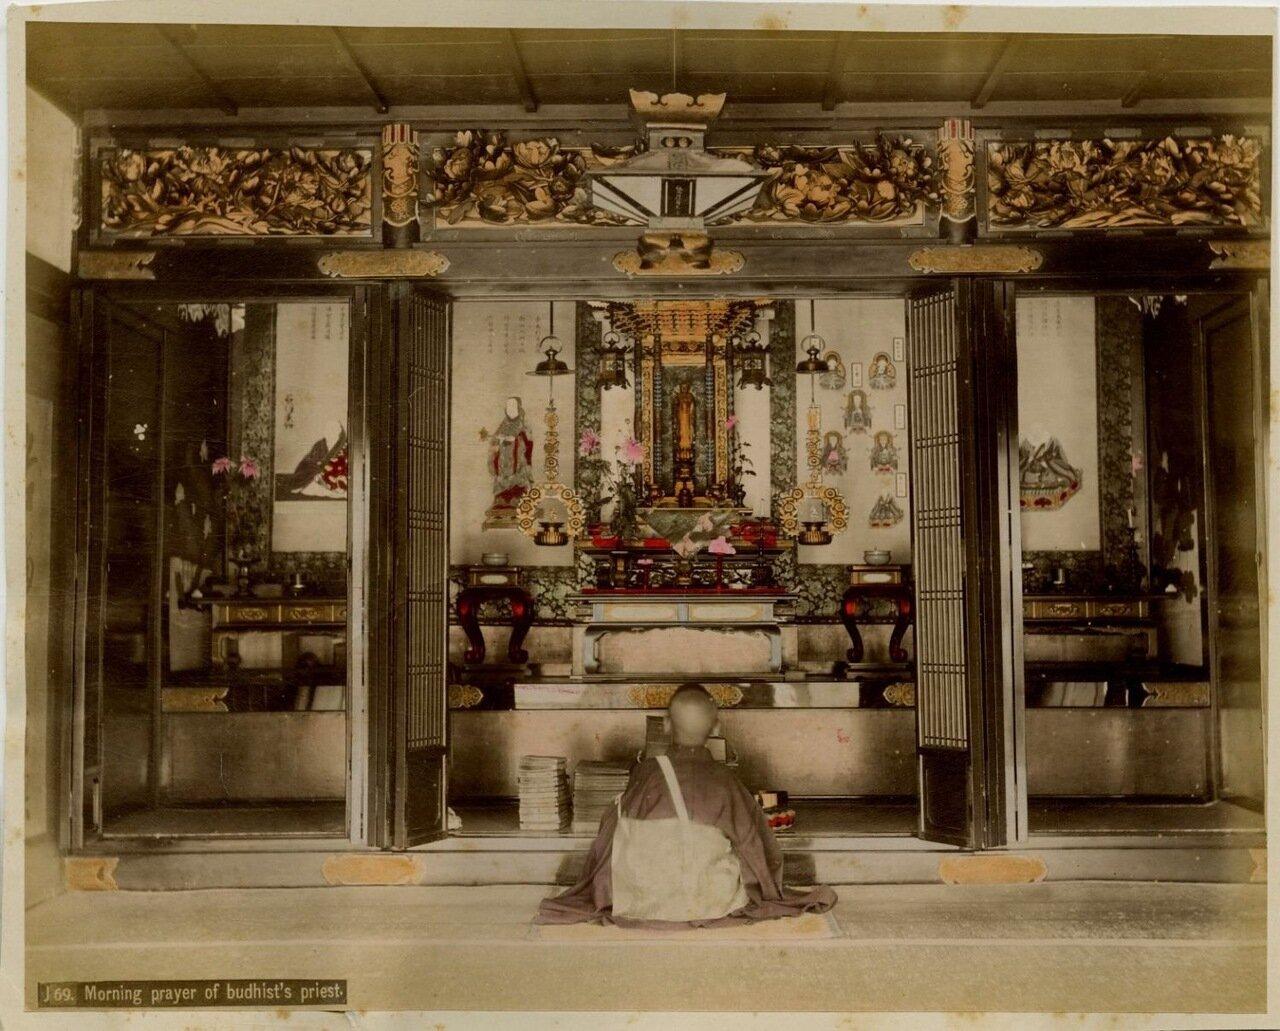 Утренняя молитва буддийского священника